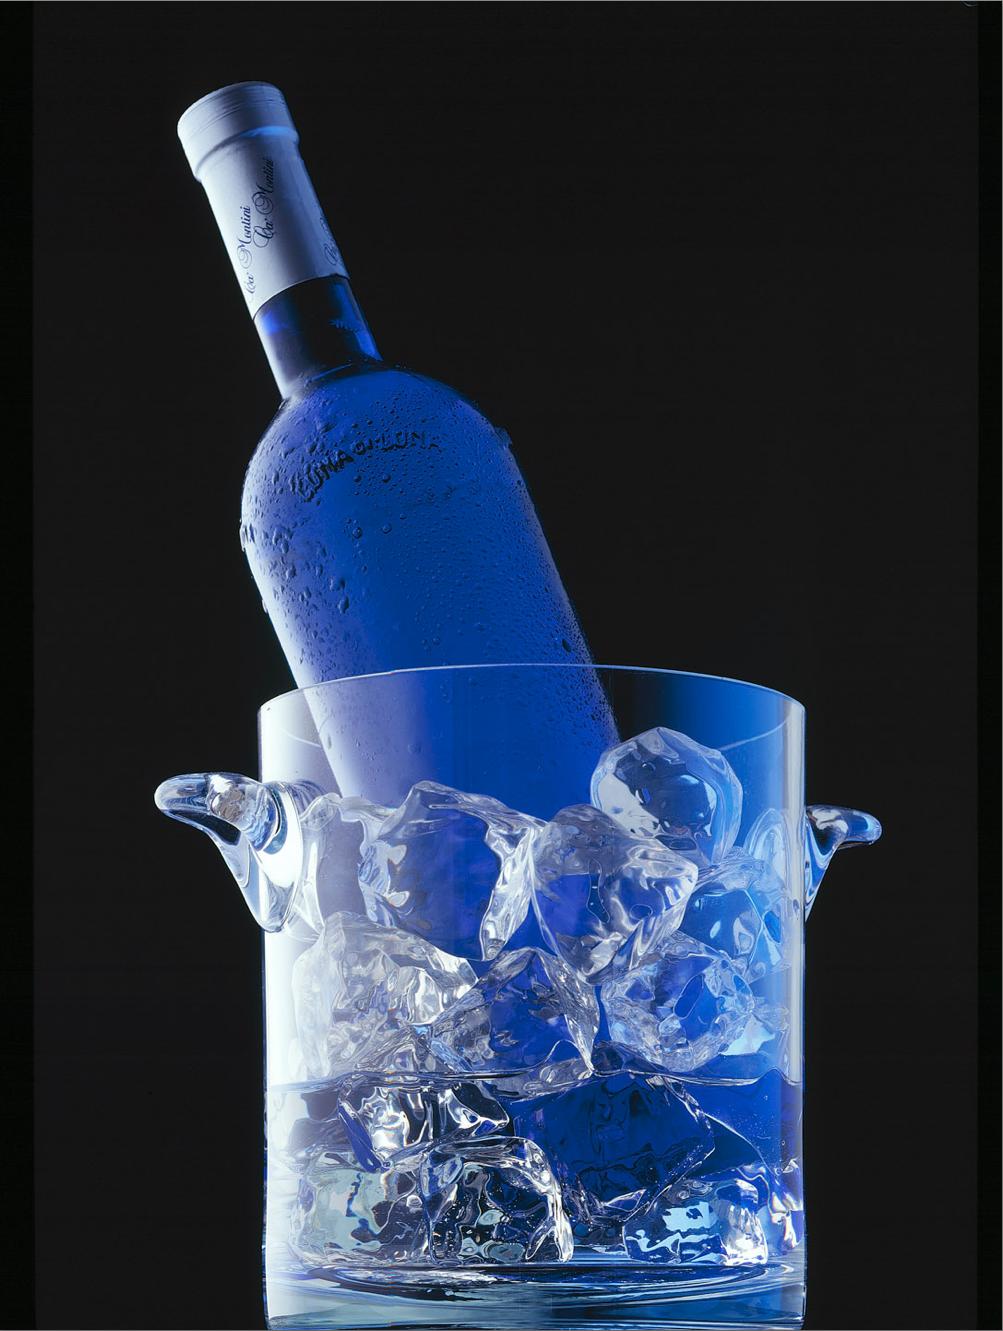 Blue Bottle on Ice